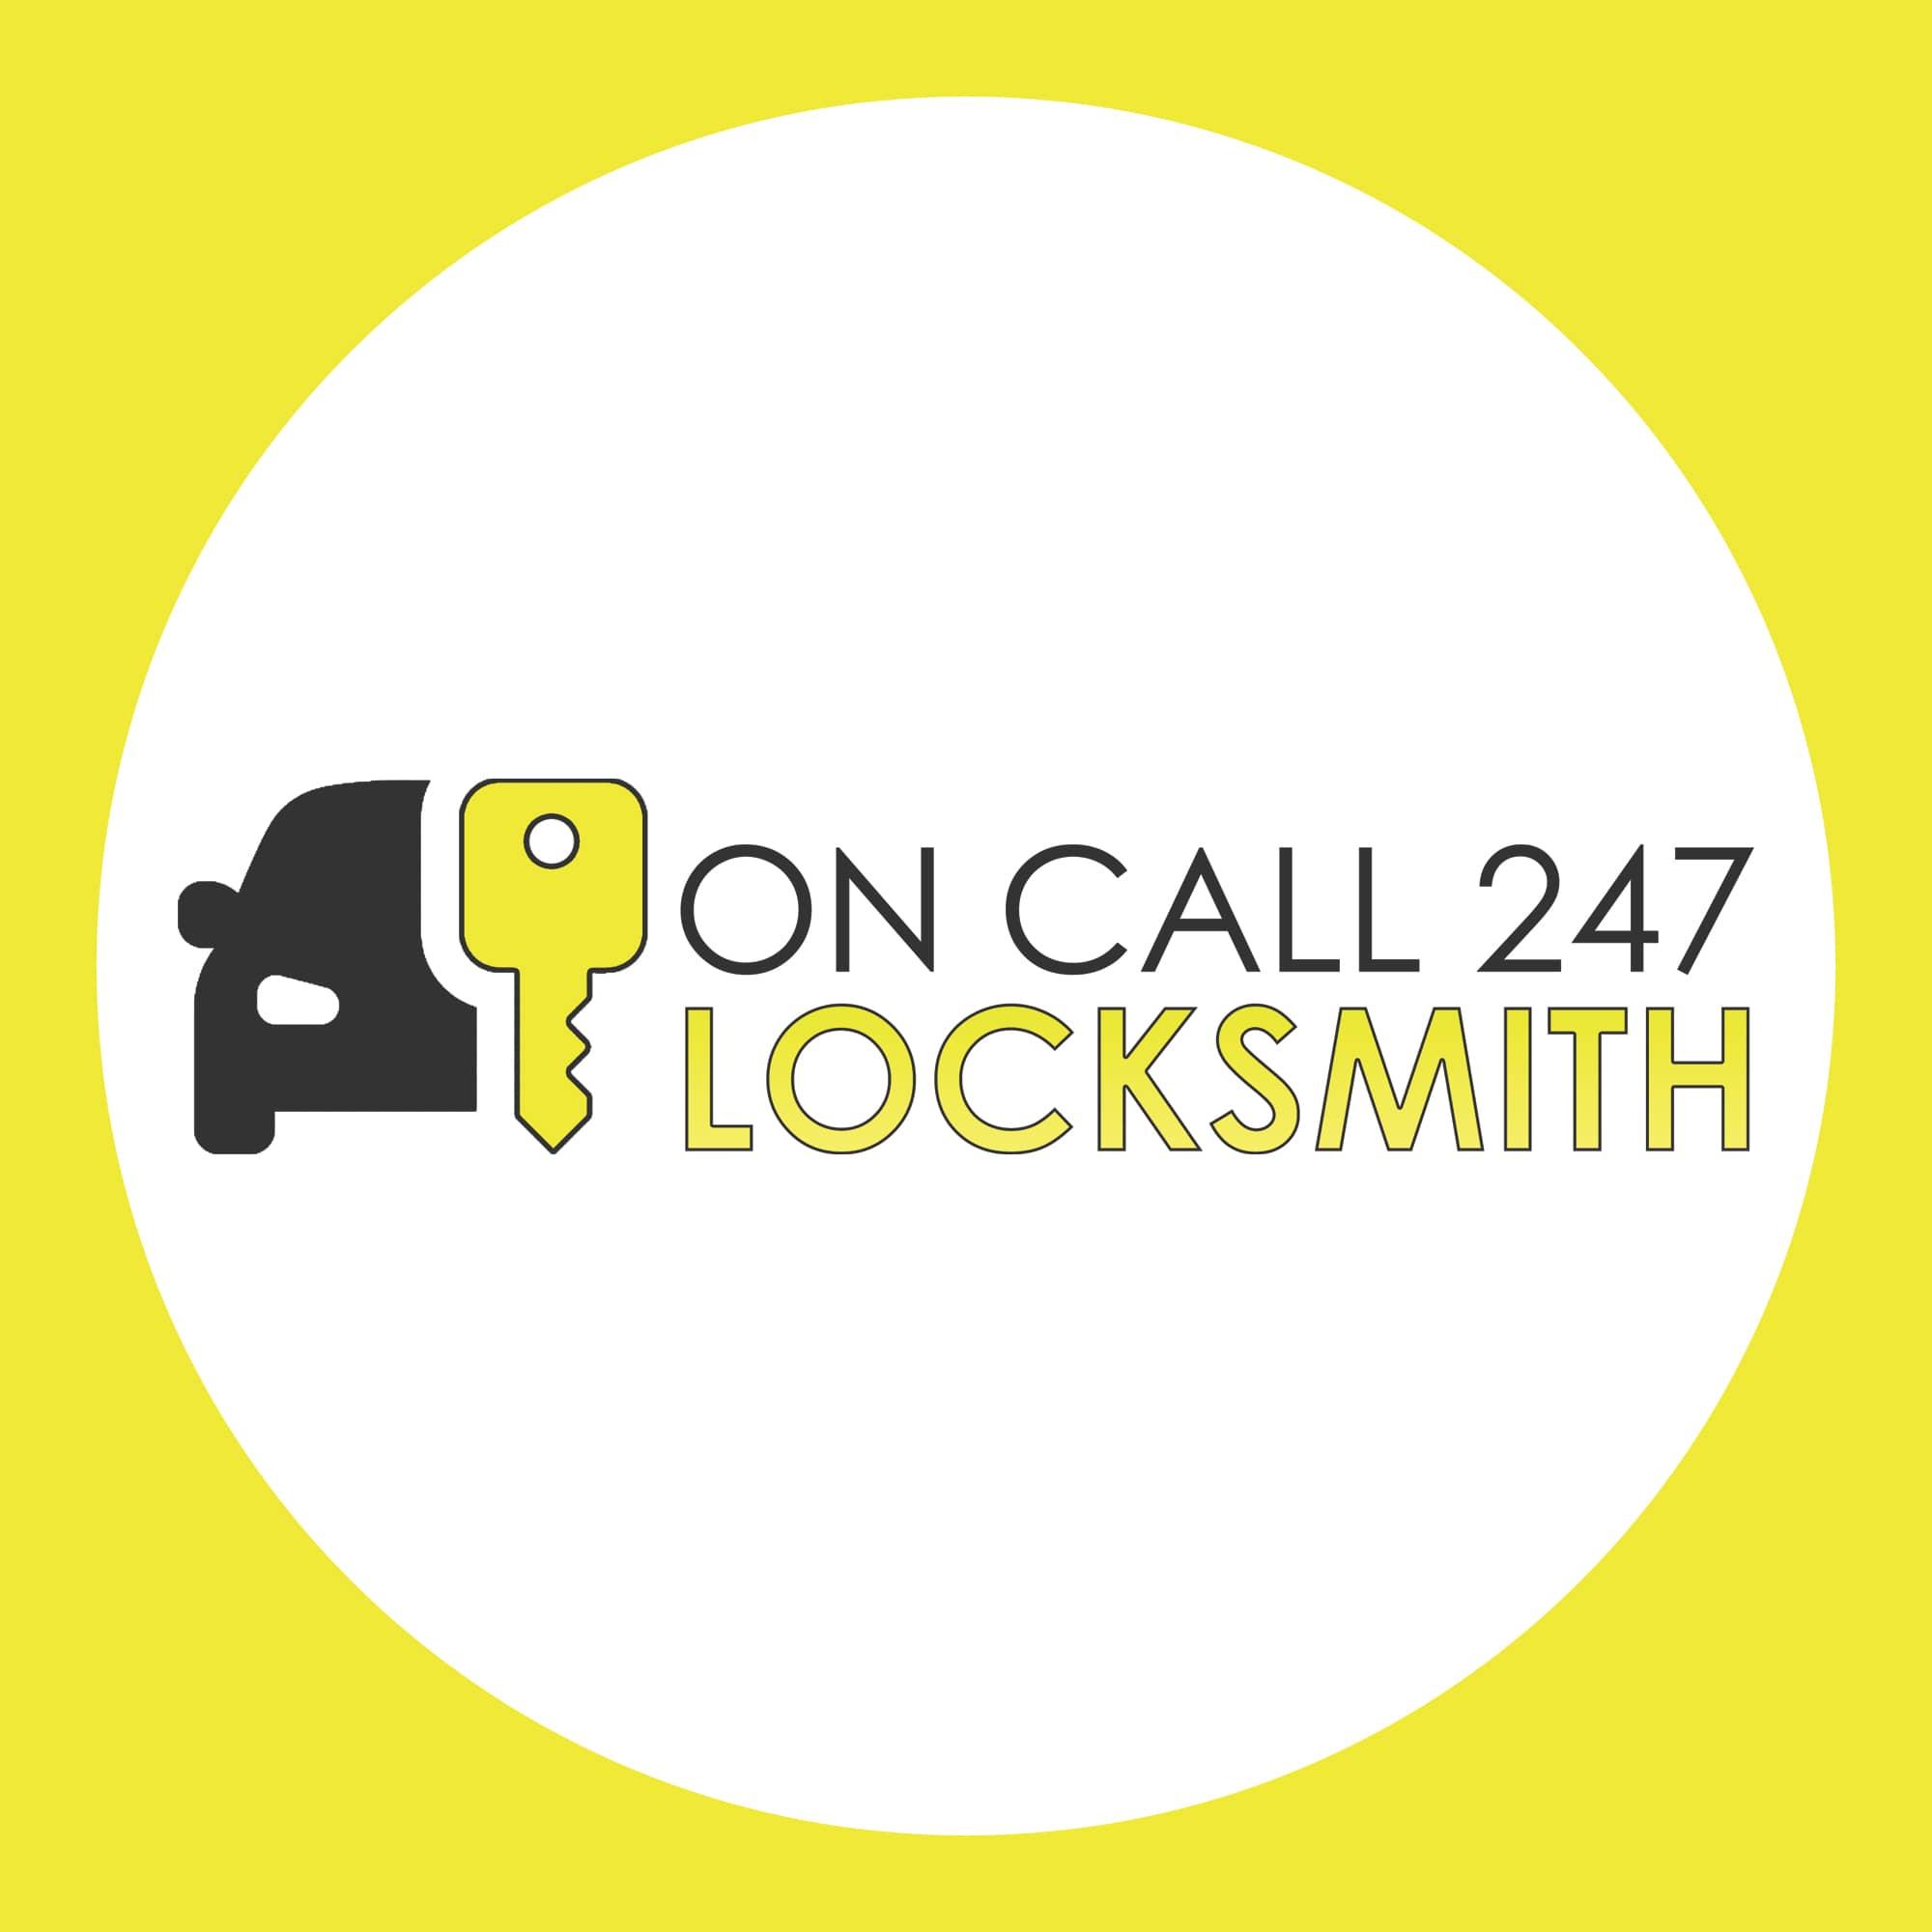 On Call 24/7 Locksmith Dallas